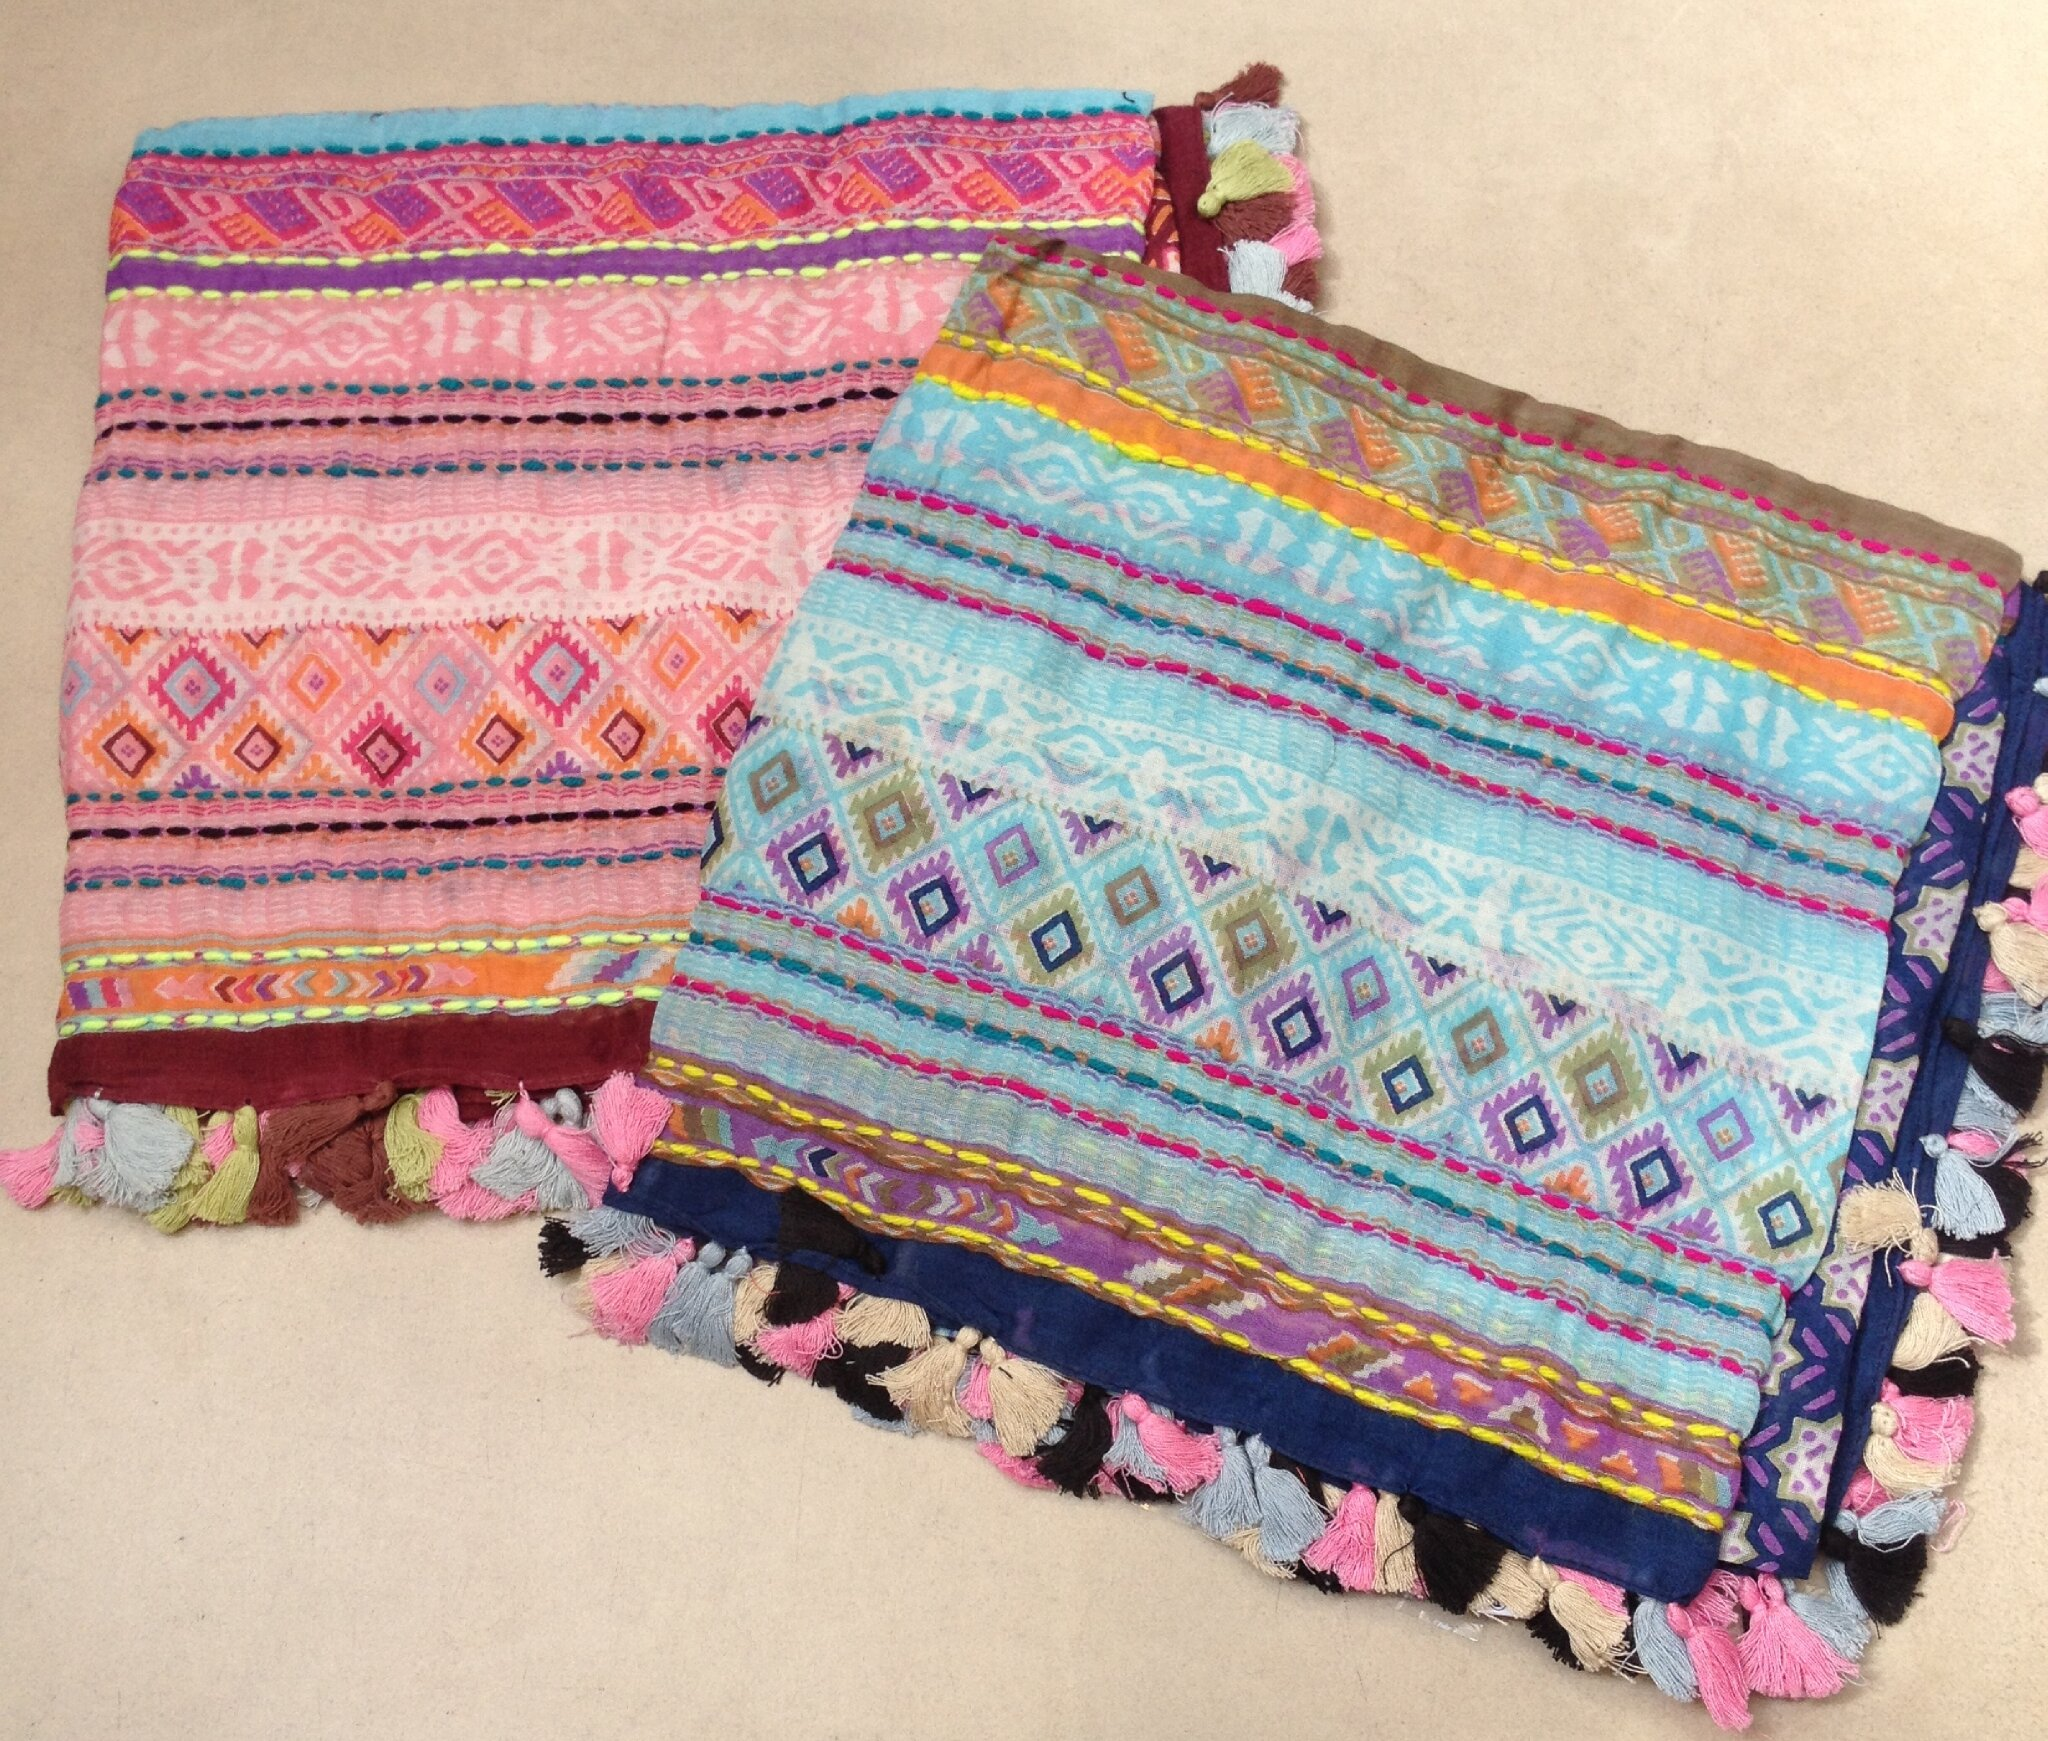 Foulard Triangle - Chèche 'Boho Hippie Chic'